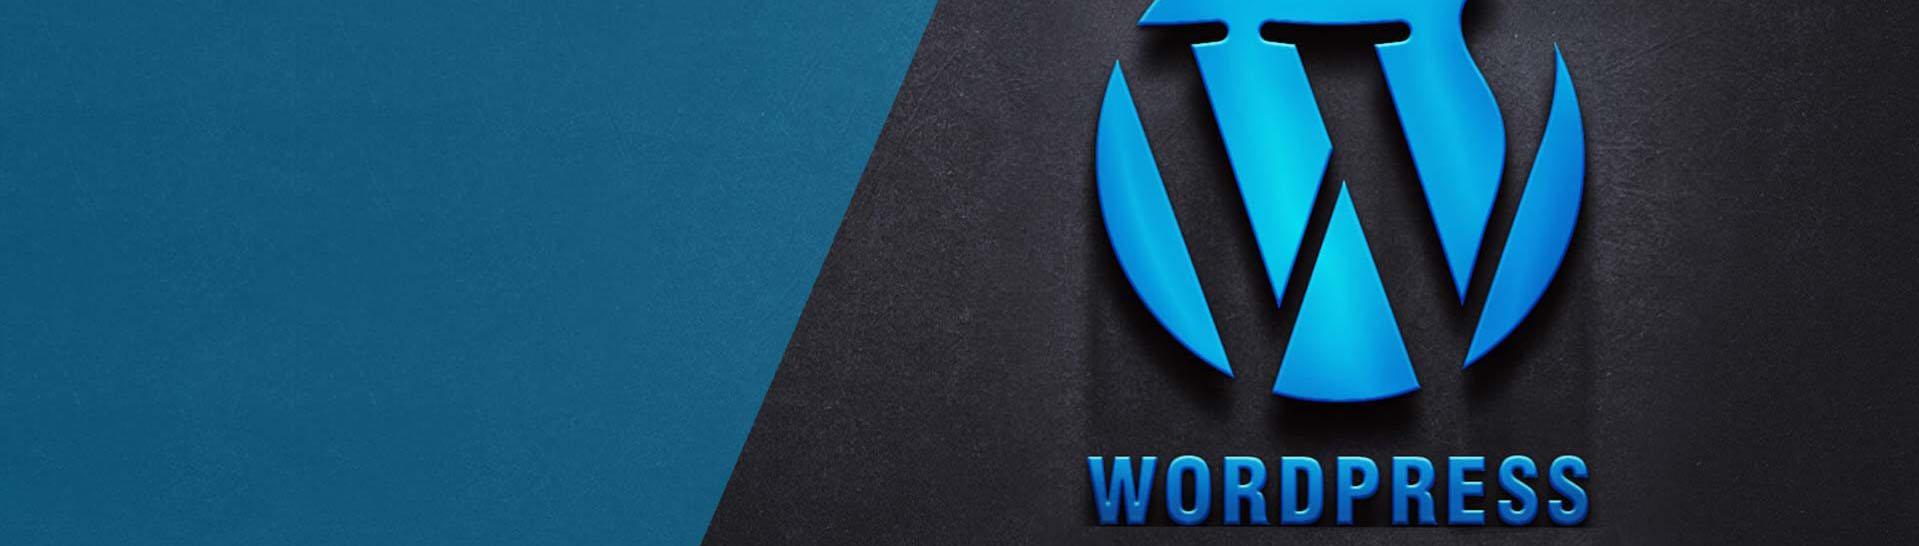 Thesimplexdesign.com - Situs SEO, Internet Marketing, Wordpress Themes